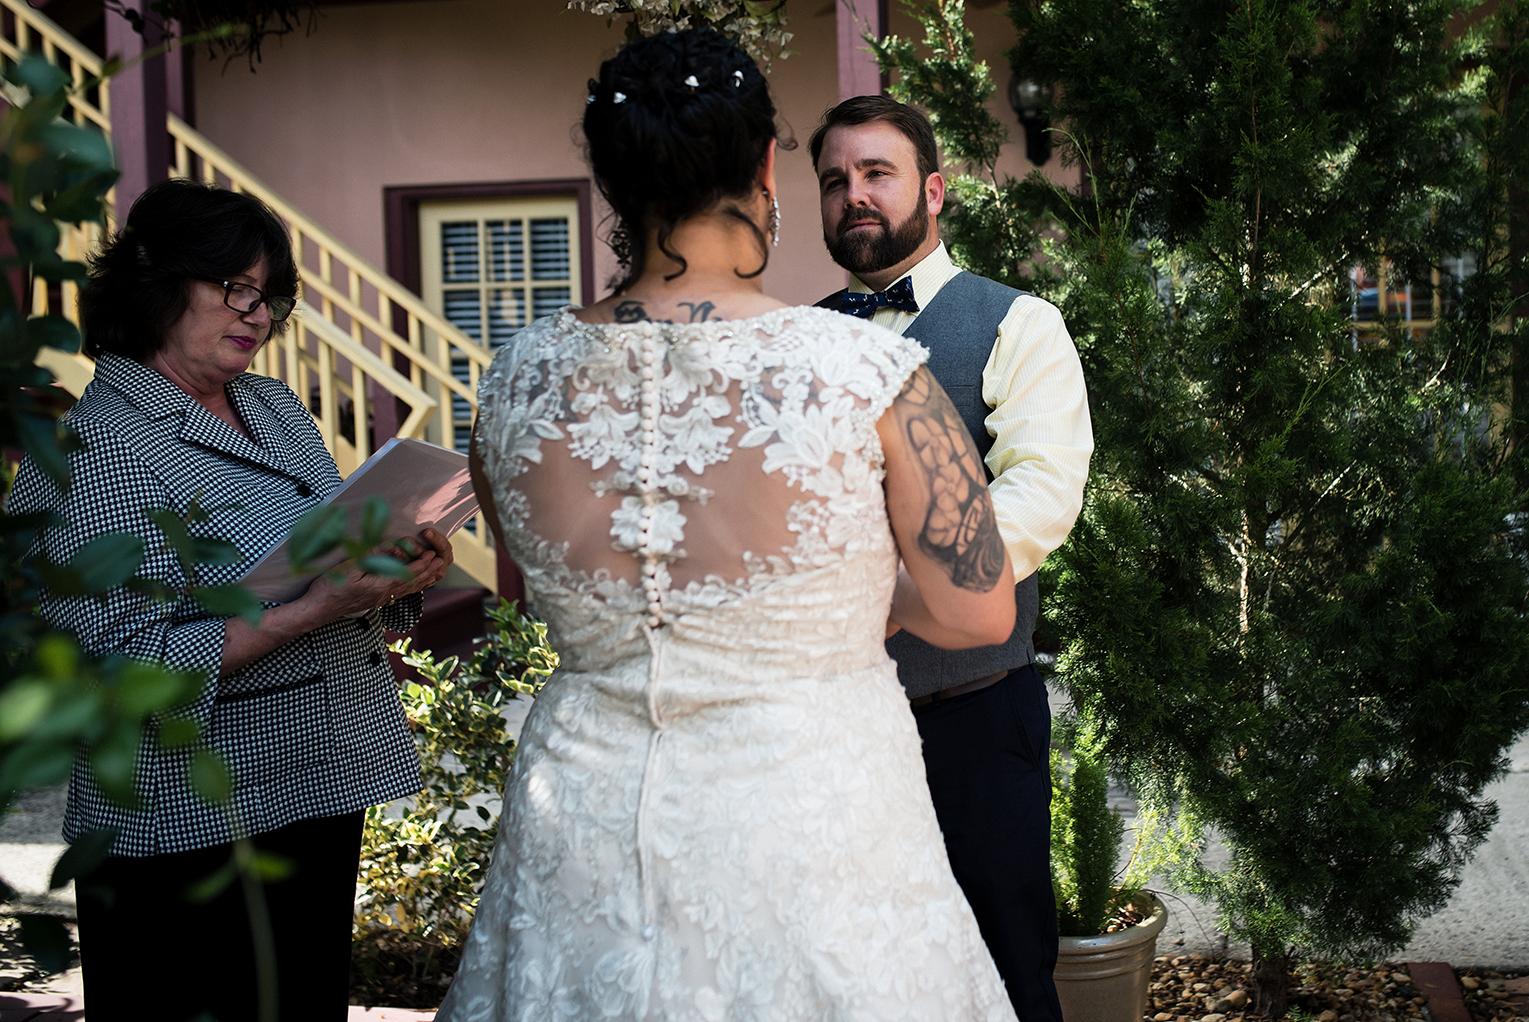 Kristin Grover Images Wedding Photographer-Jacksonville, FL Weddings-St. Augustine, FL wedding